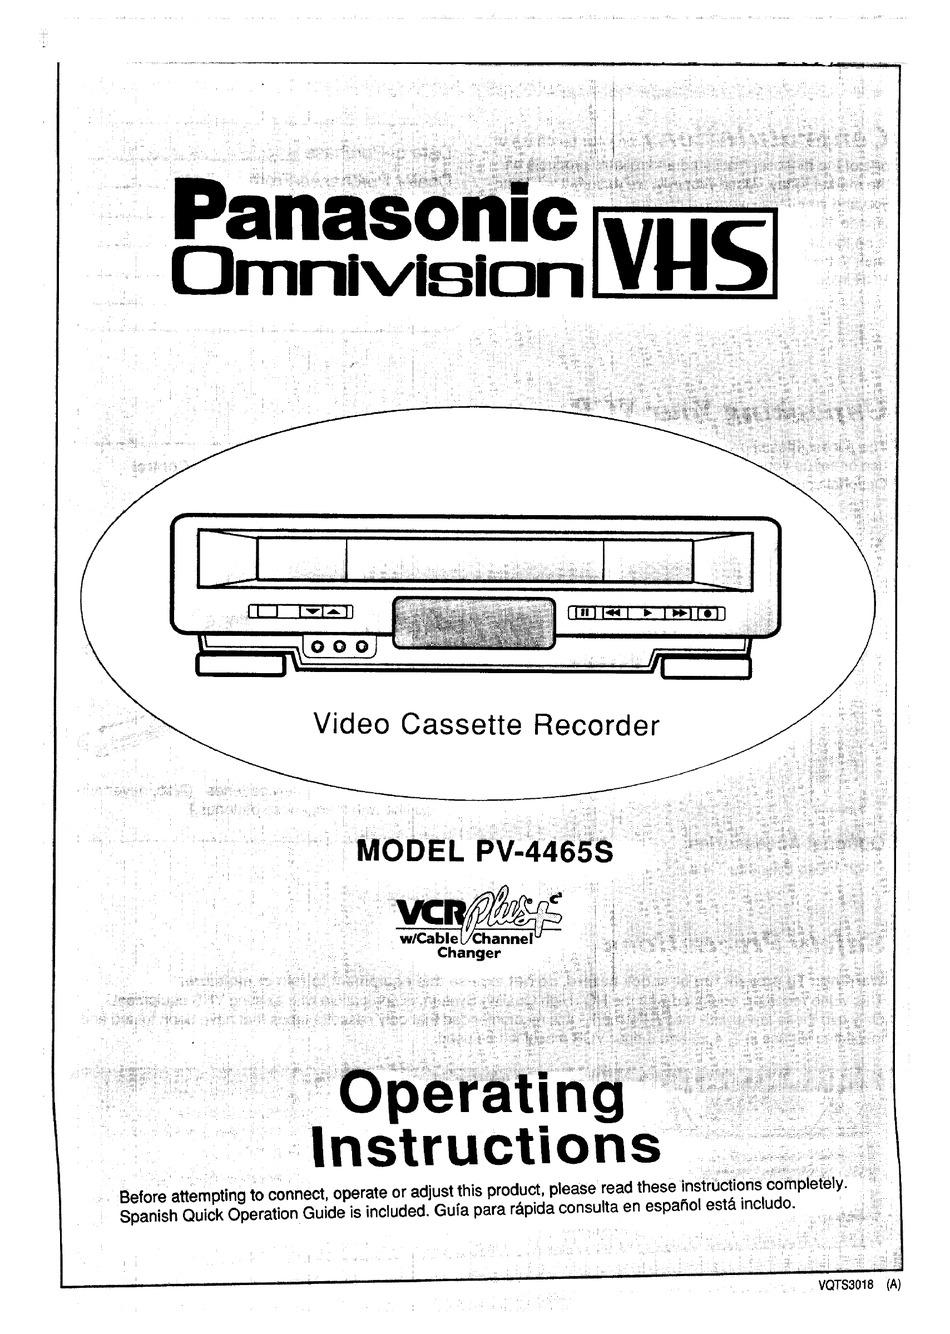 PANASONIC OMNIVISION VHS PV-4465S OPERATING INSTRUCTIONS